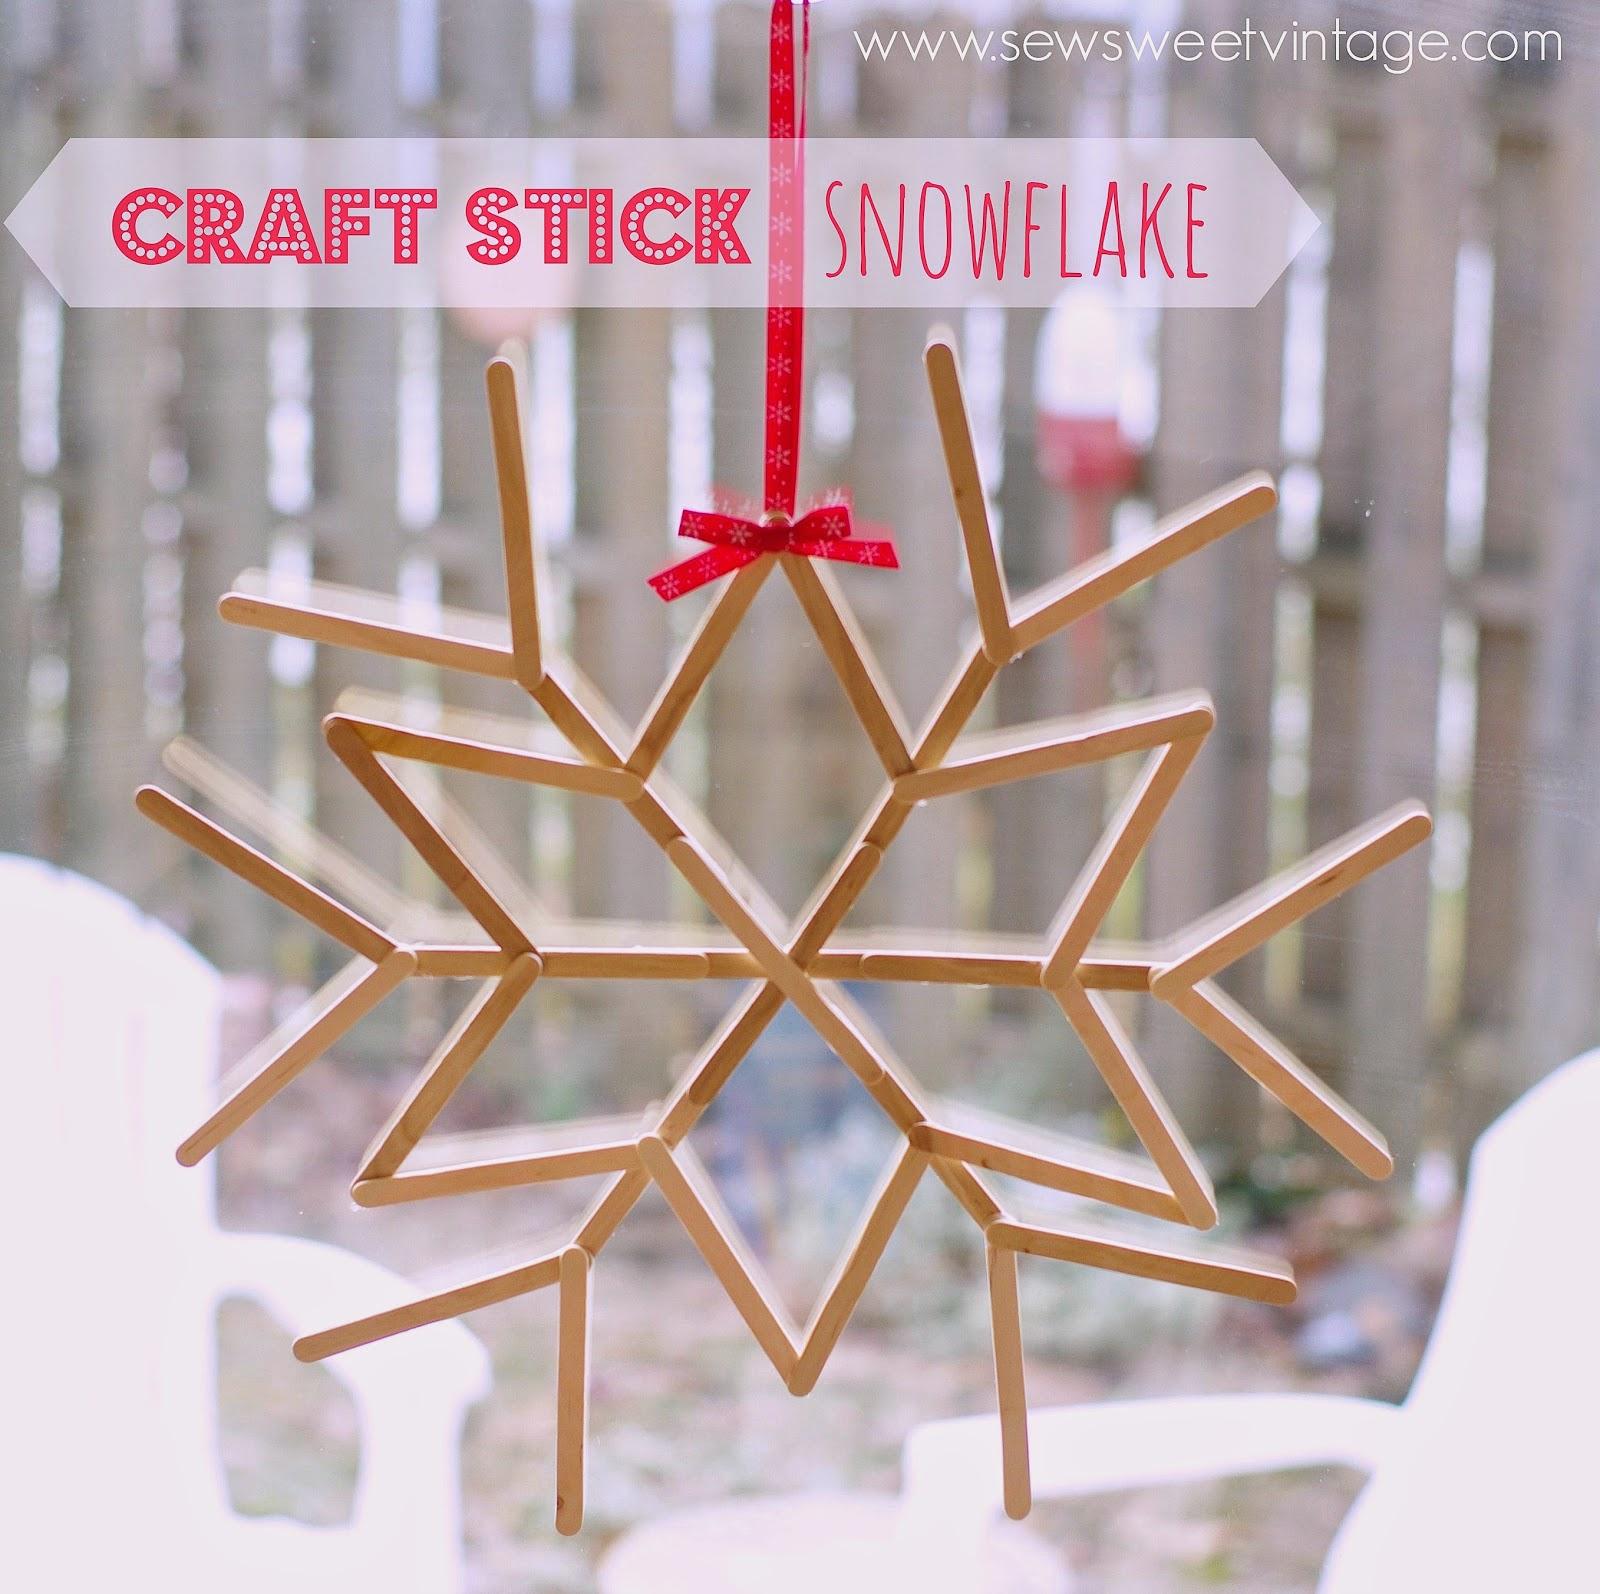 Craft Stick Snowflake Tutorial by Sew Sweet Vintage